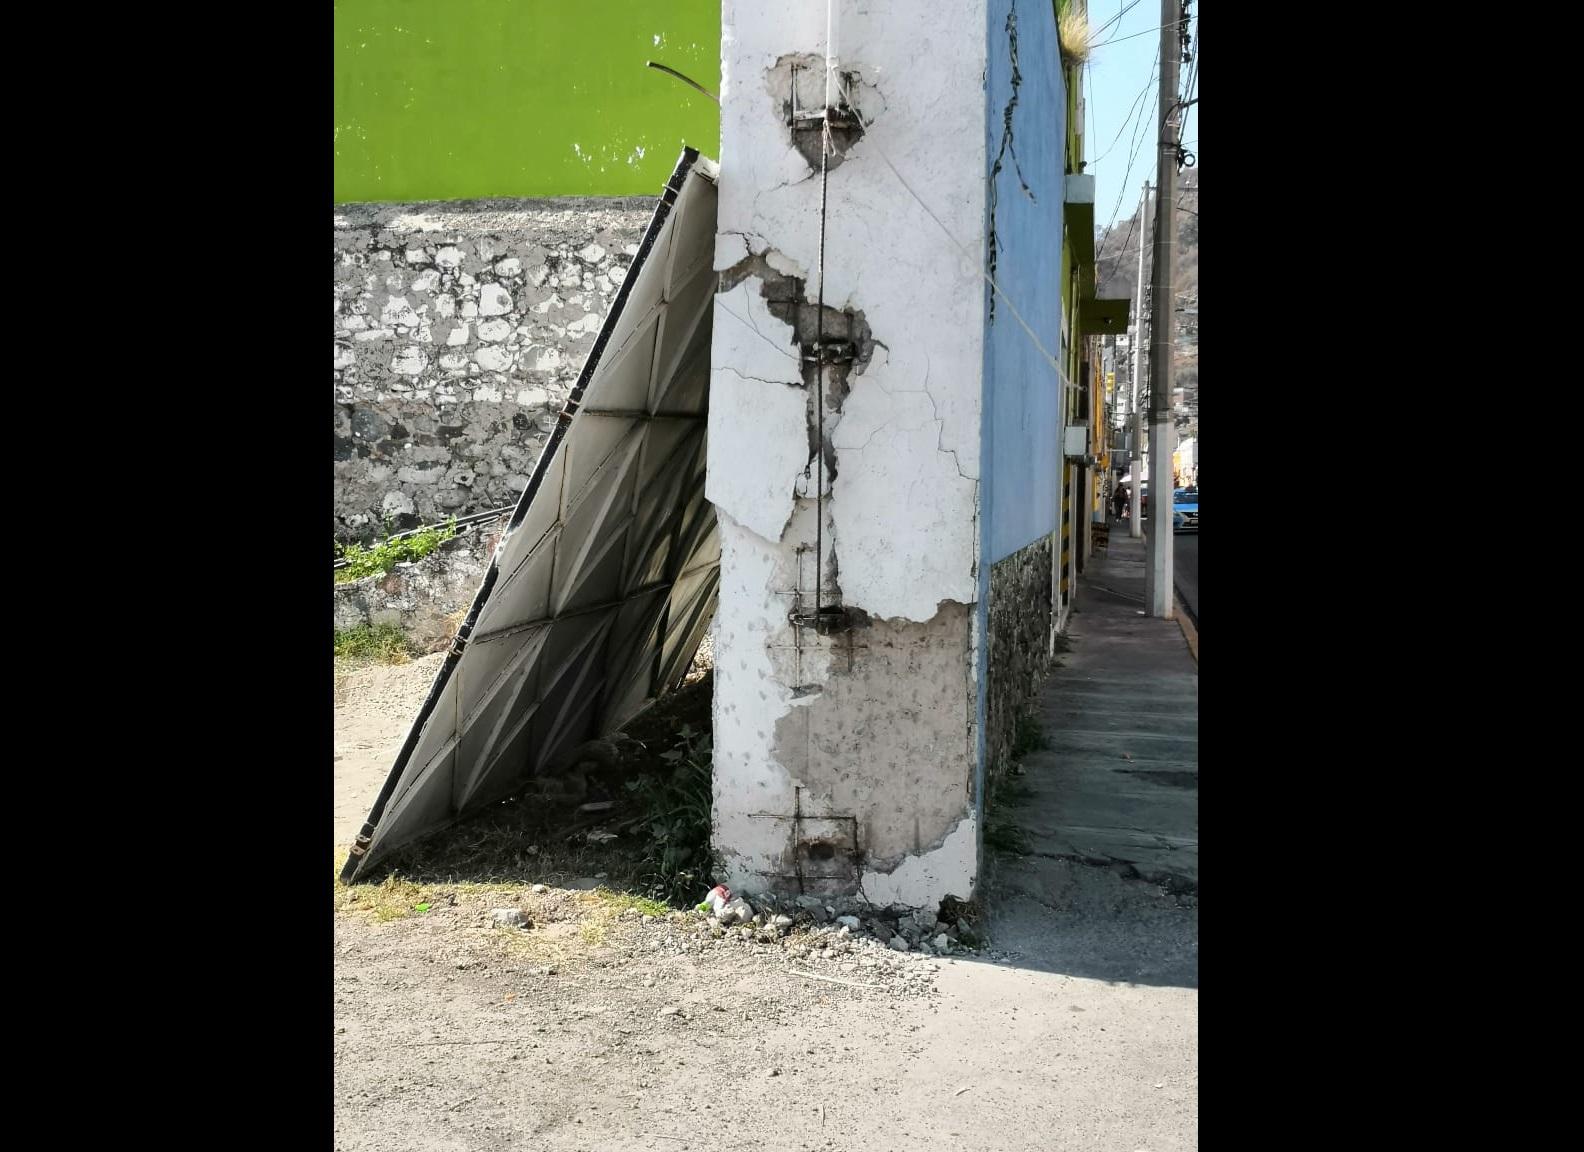 Tumban de golpe puerta del Centro de Convenciones en Atlixco